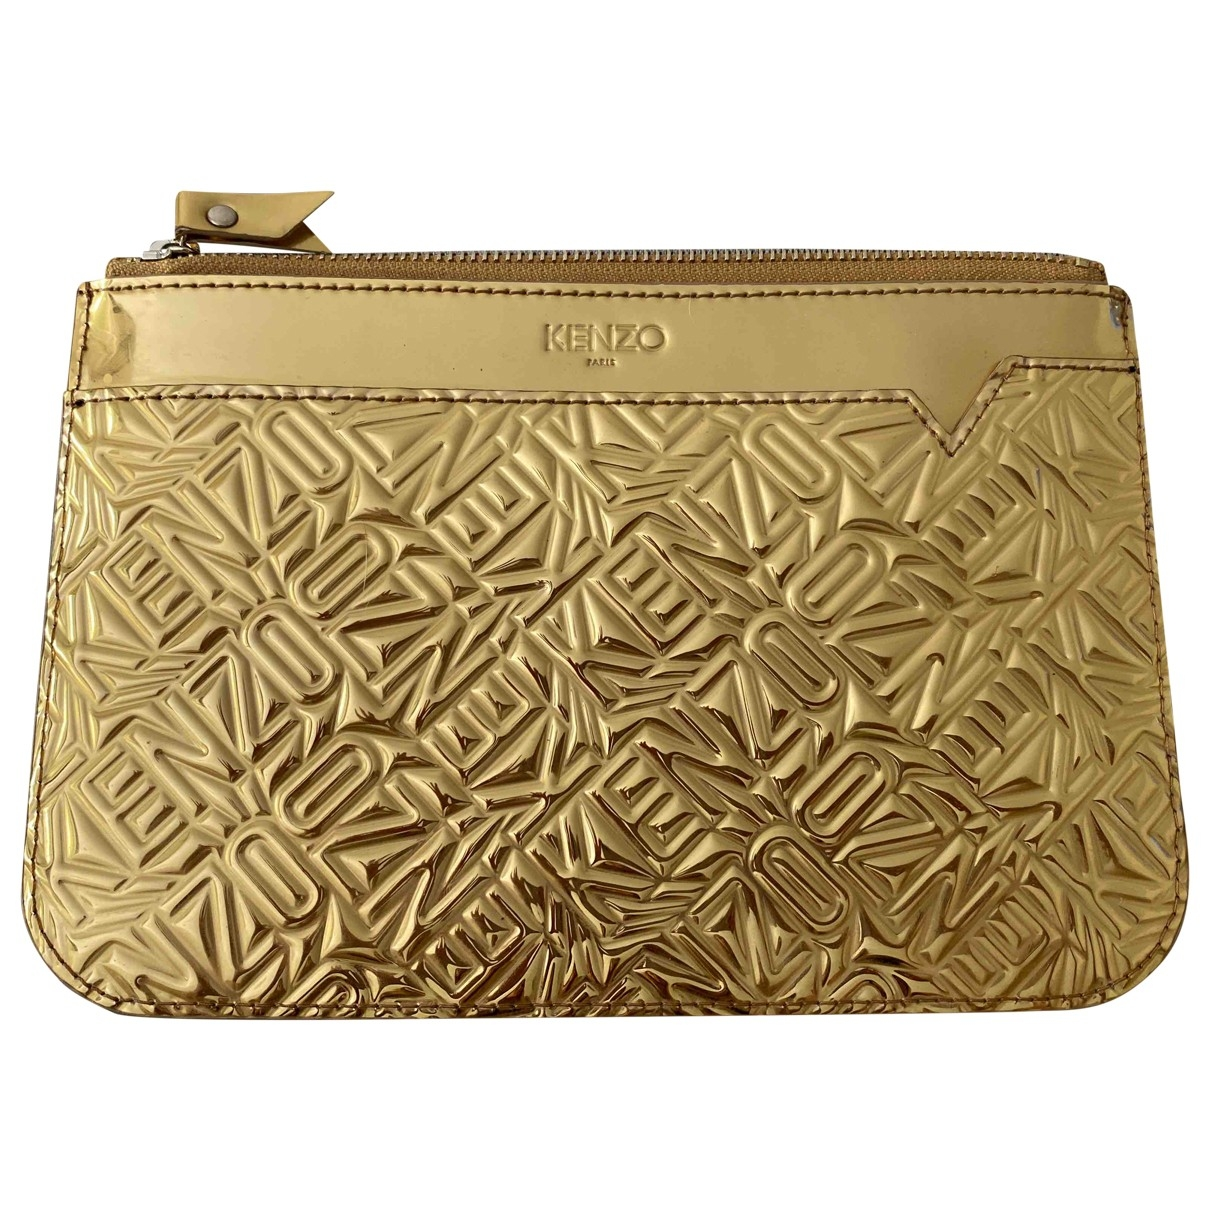 Kenzo \N Gold Leather Clutch bag for Women \N